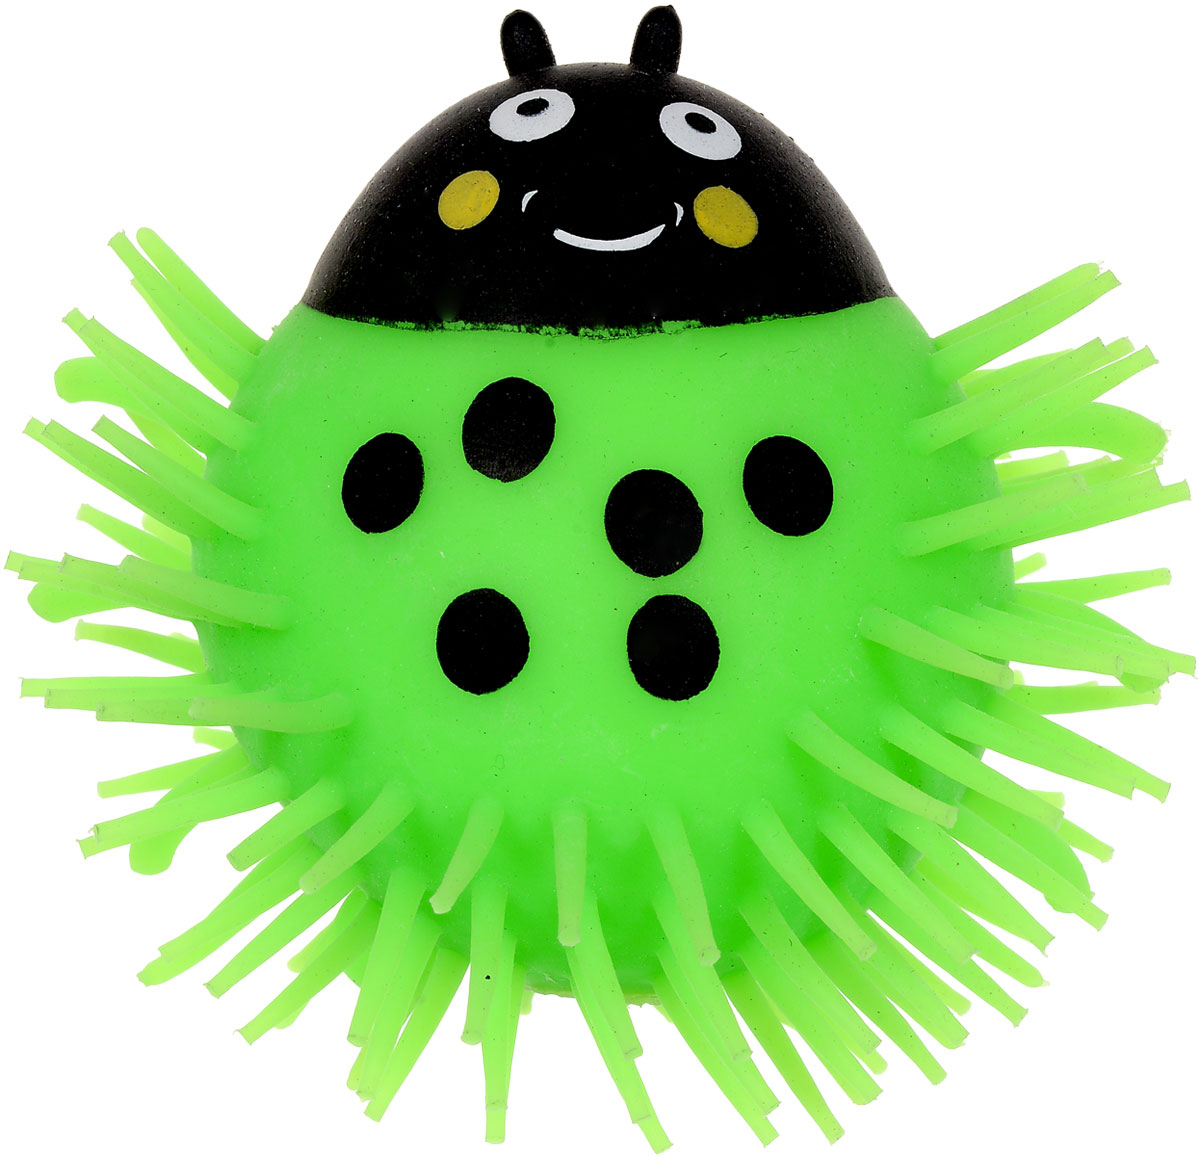 1TOY Игрушка-антистресс Ё-Ёжик Жук цвет зеленый техника ё ёжик со светомт56556